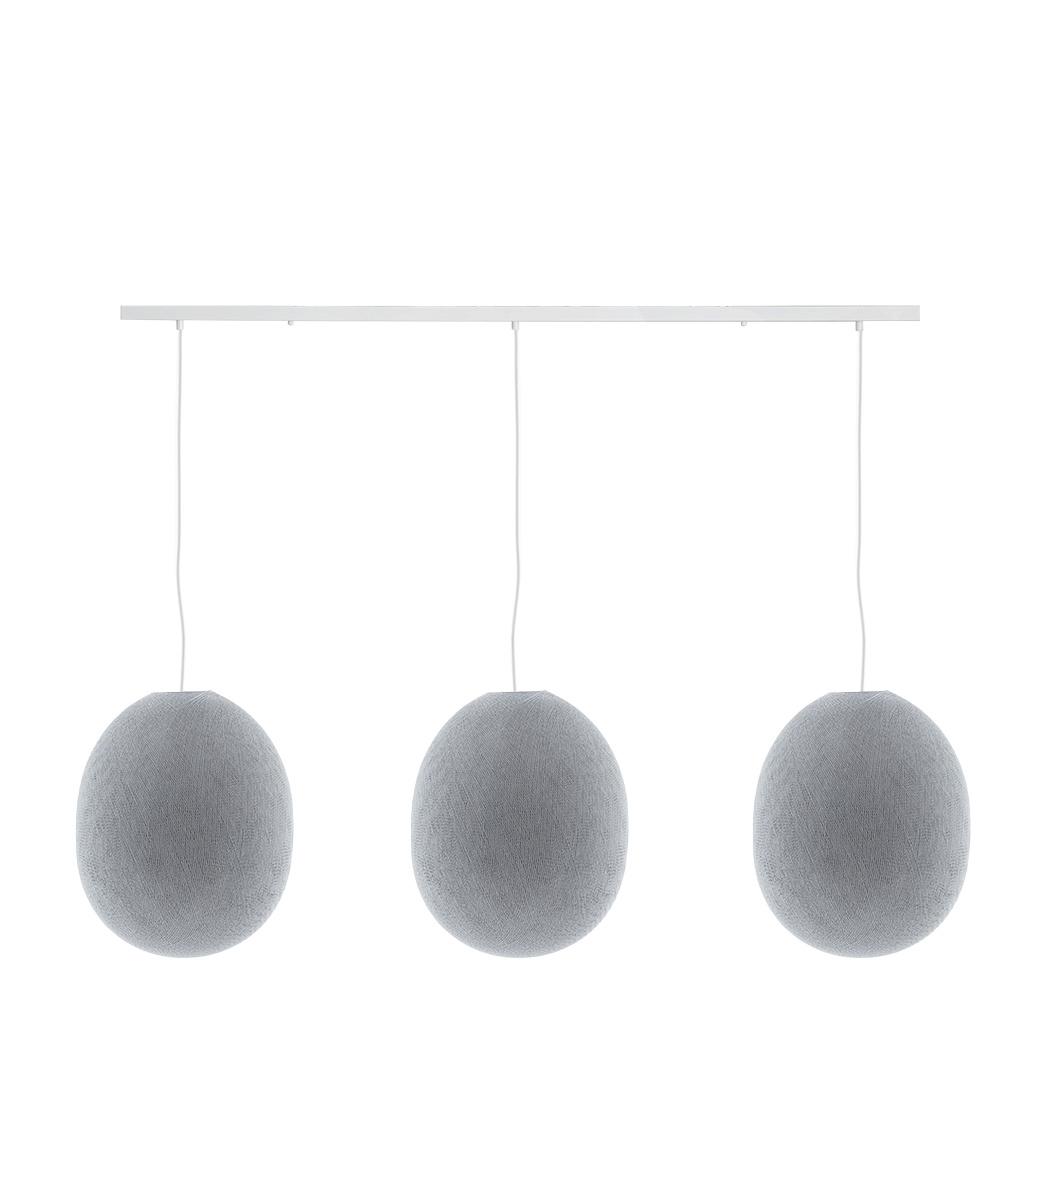 Cotton Ball Lights Drievoudige hanglamp balk - Oval Stone